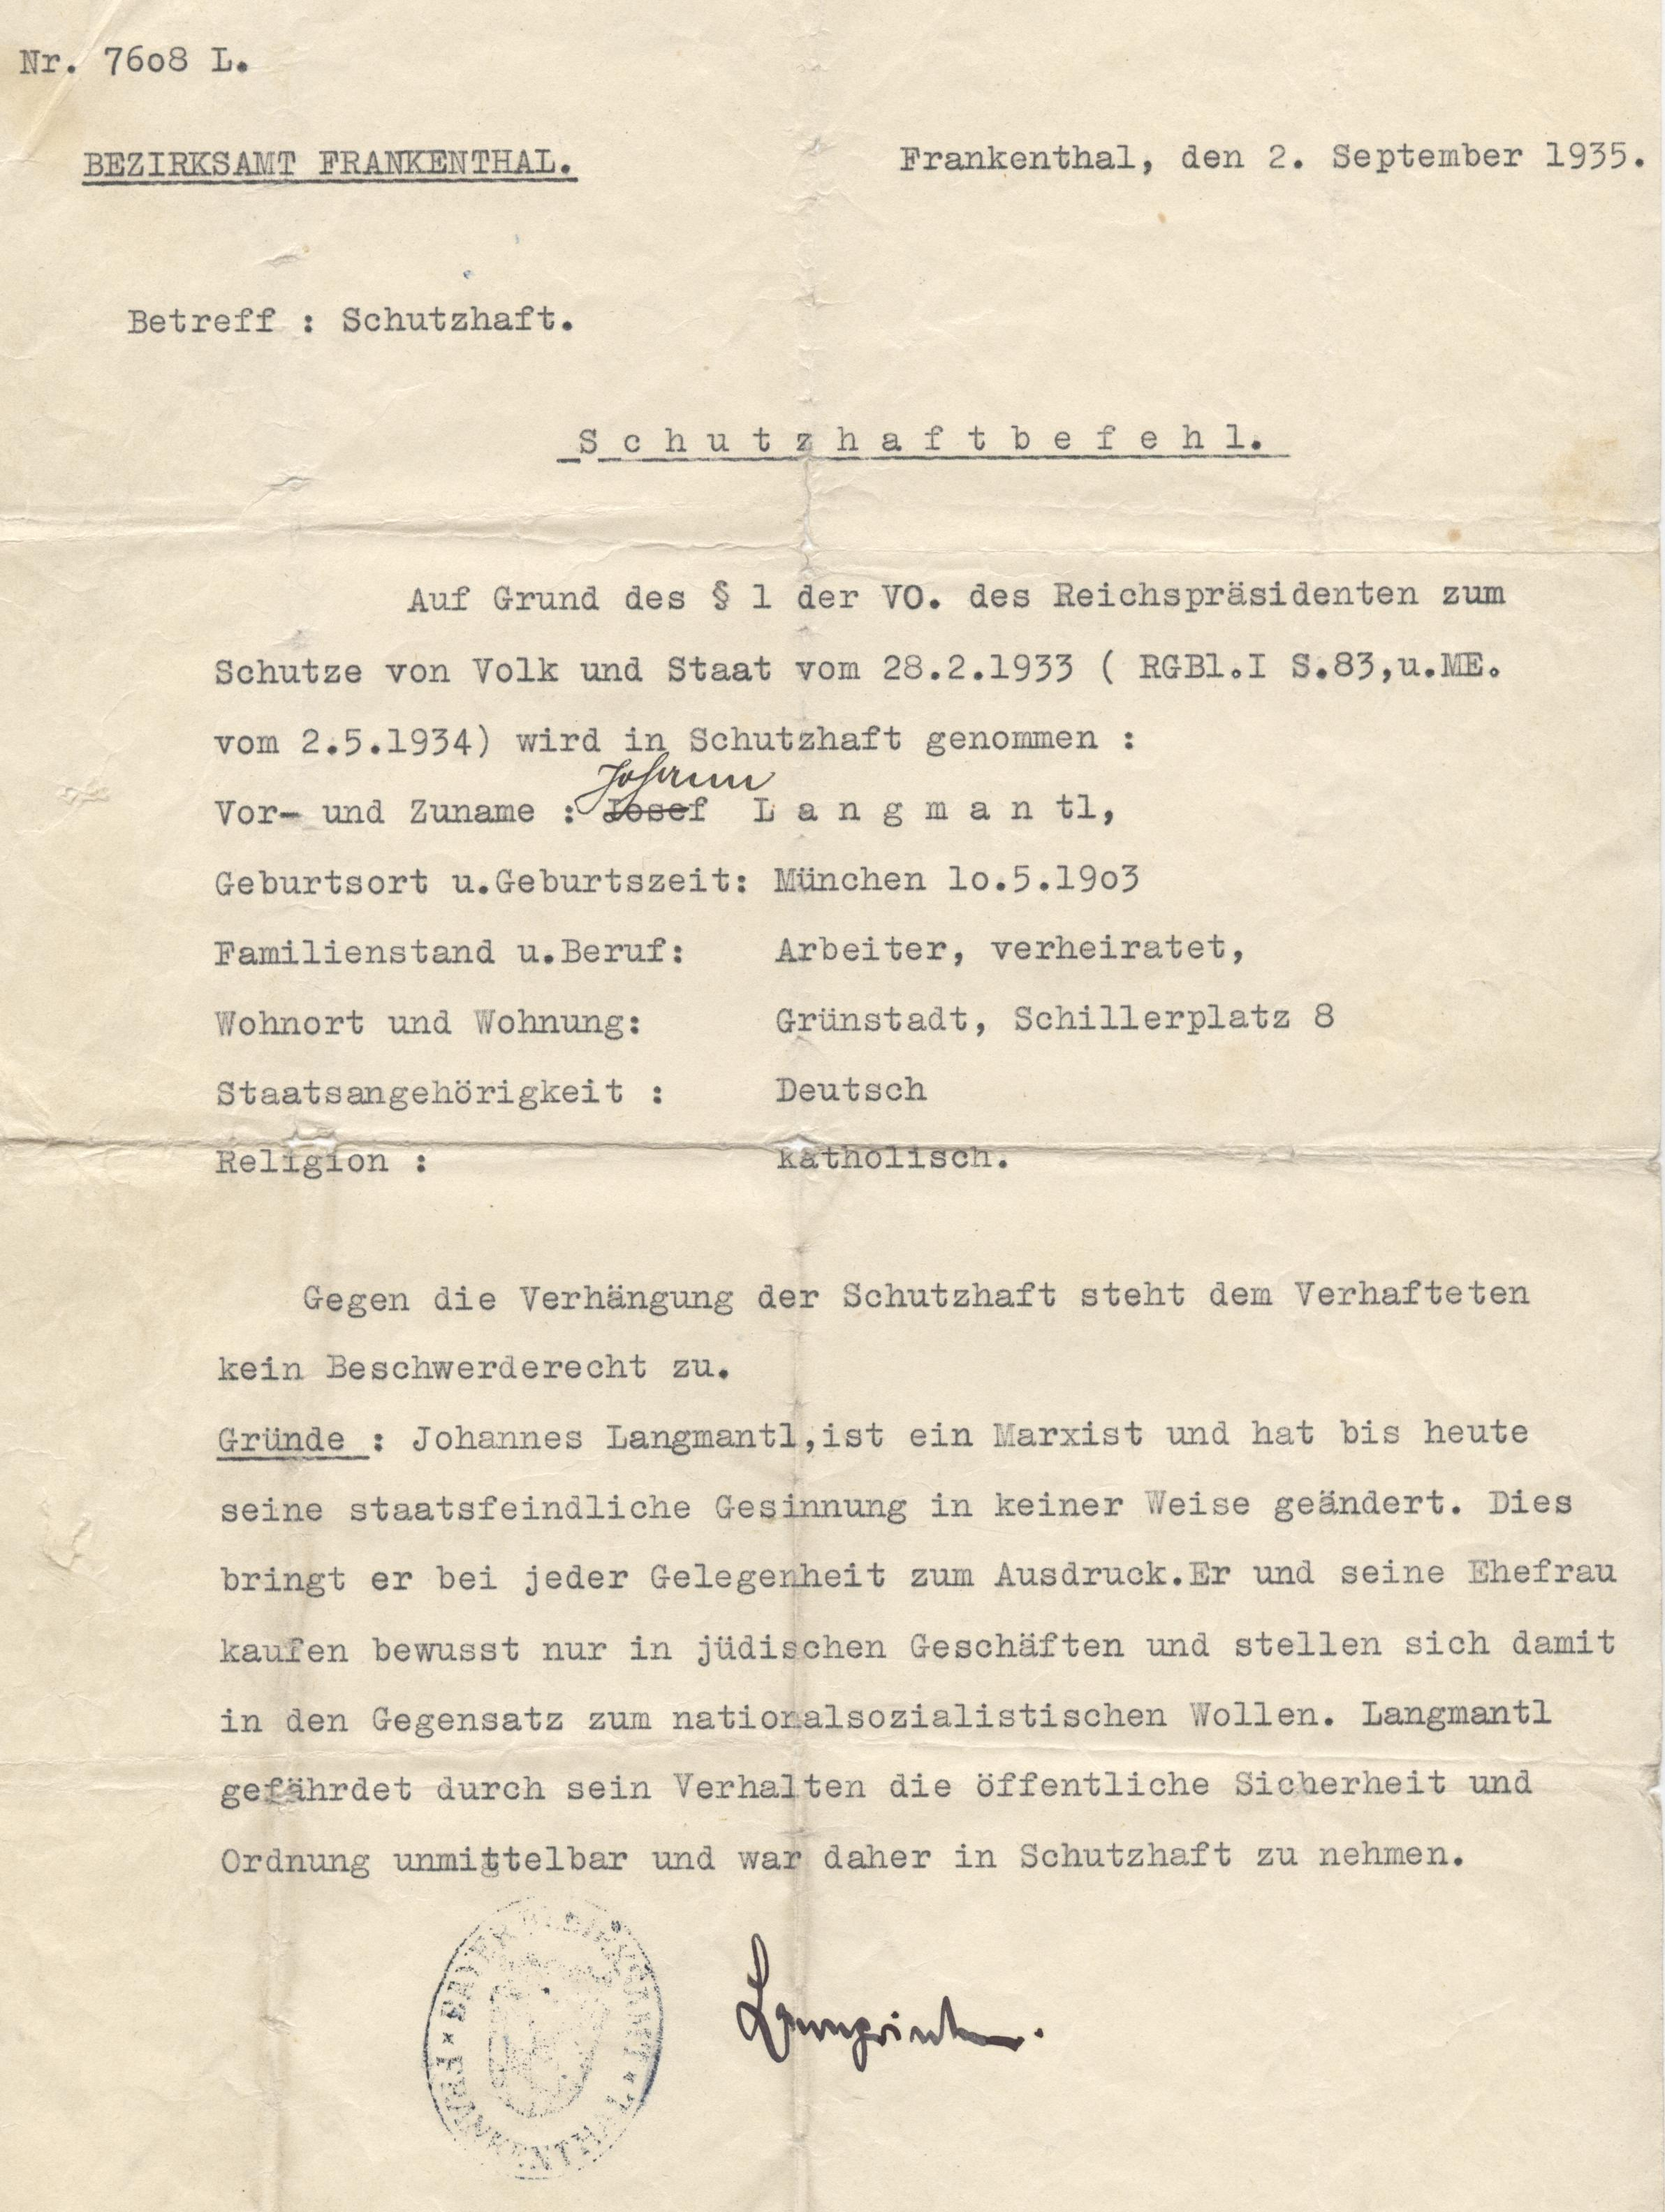 Schutzhaftbefehl des Bezirksamtes Frankenthal (Pfalz) gegen Hans Langmantl, 2. September 1935